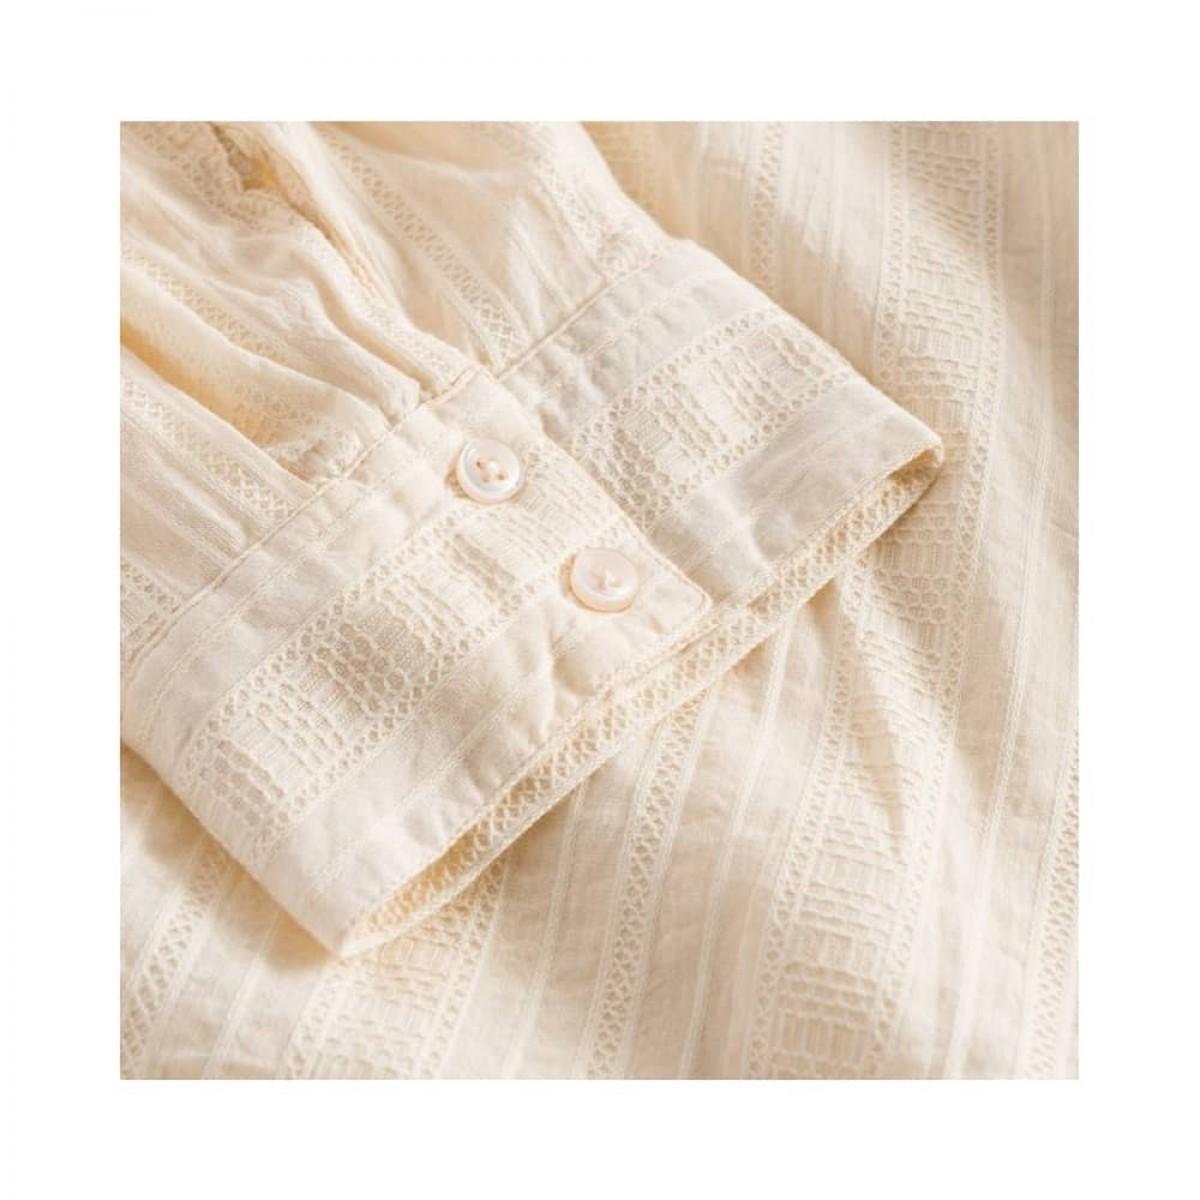 romala shirt - cream - ærme detalje